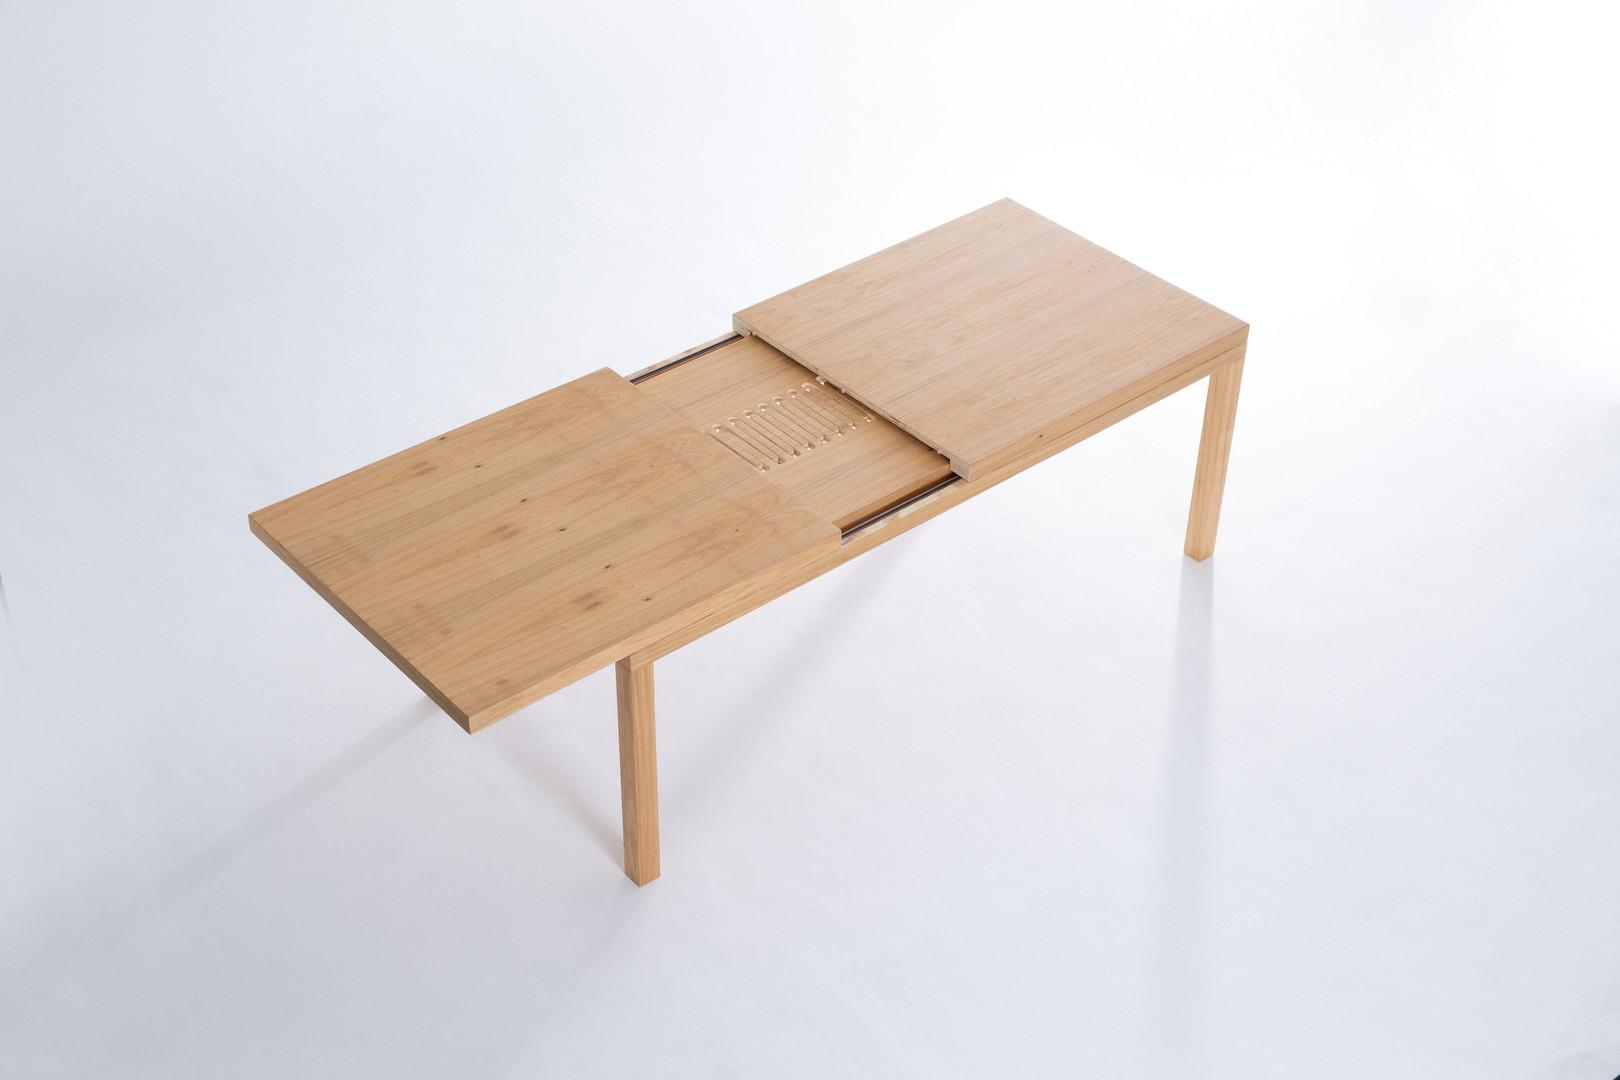 Mesa pente abrindo.jpg